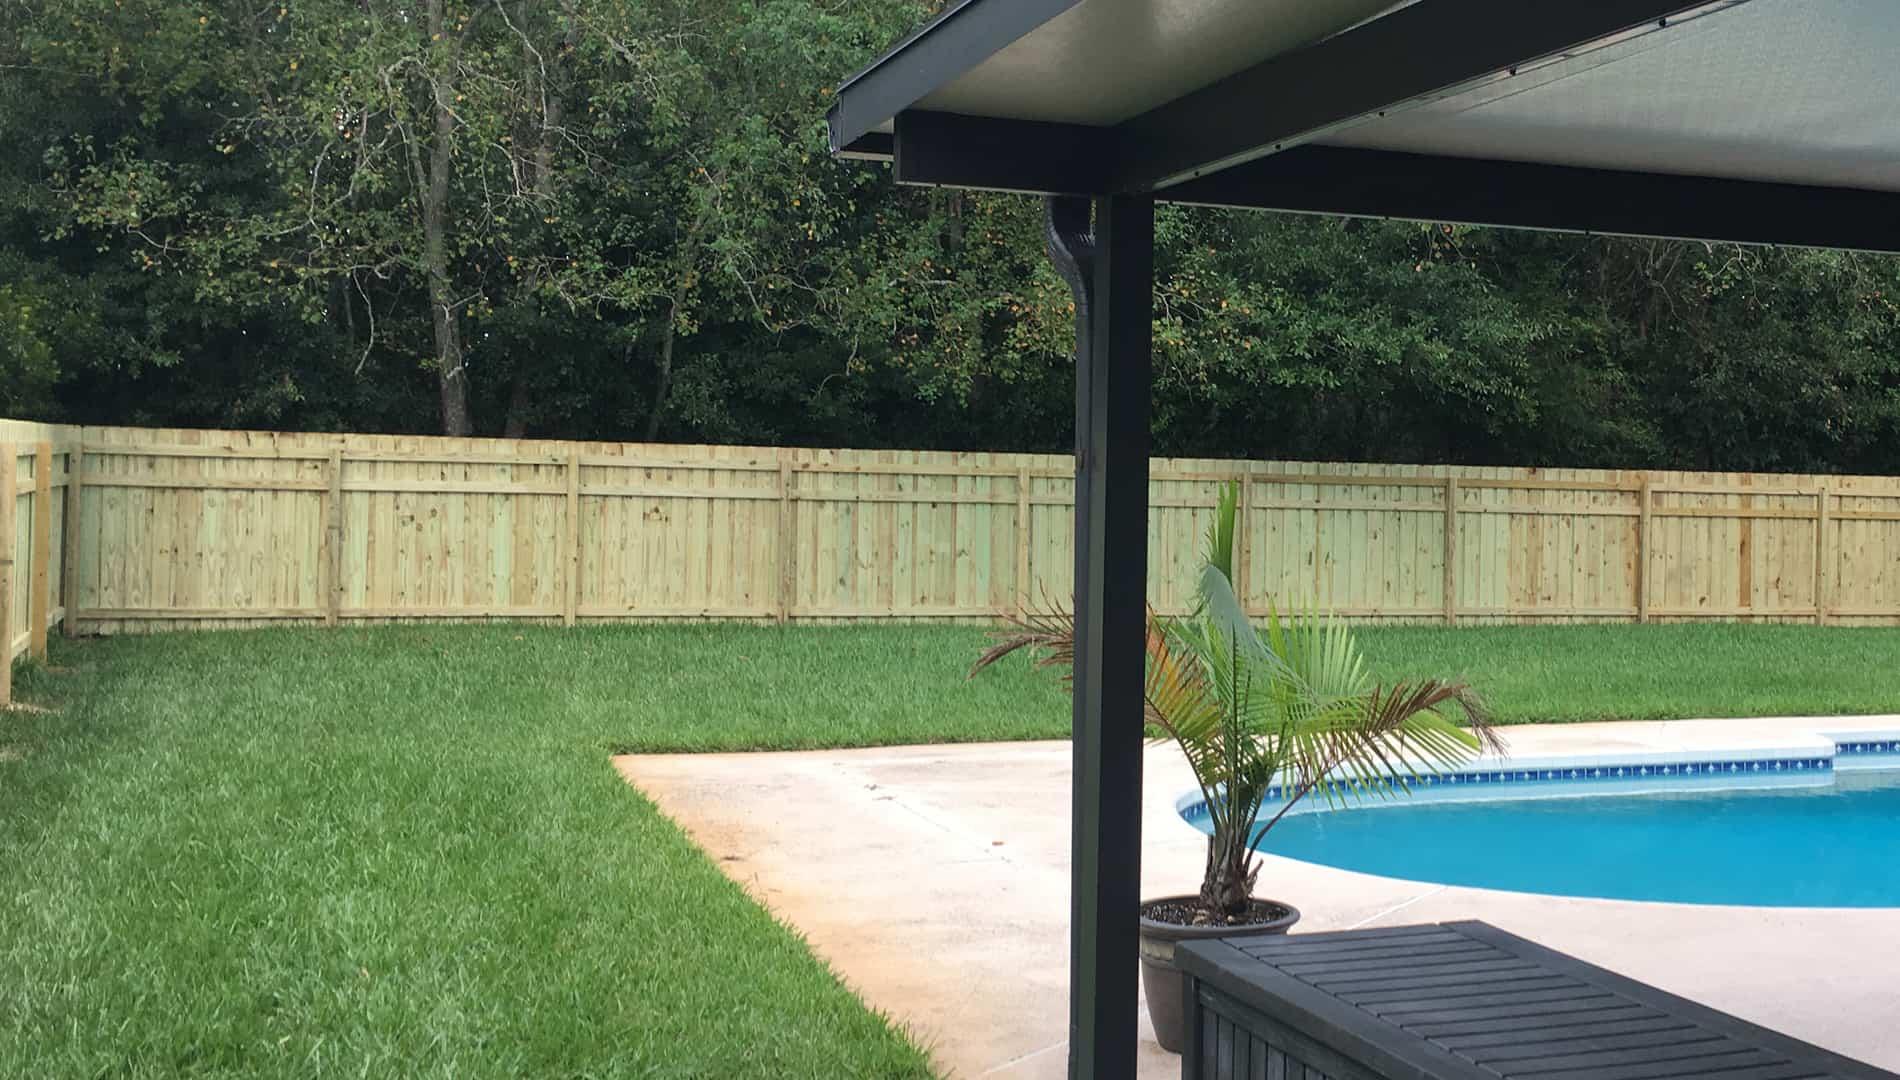 https://www.superiorfenceandrail.com/wp-content/uploads/2020/06/wood-pool-fence.jpg